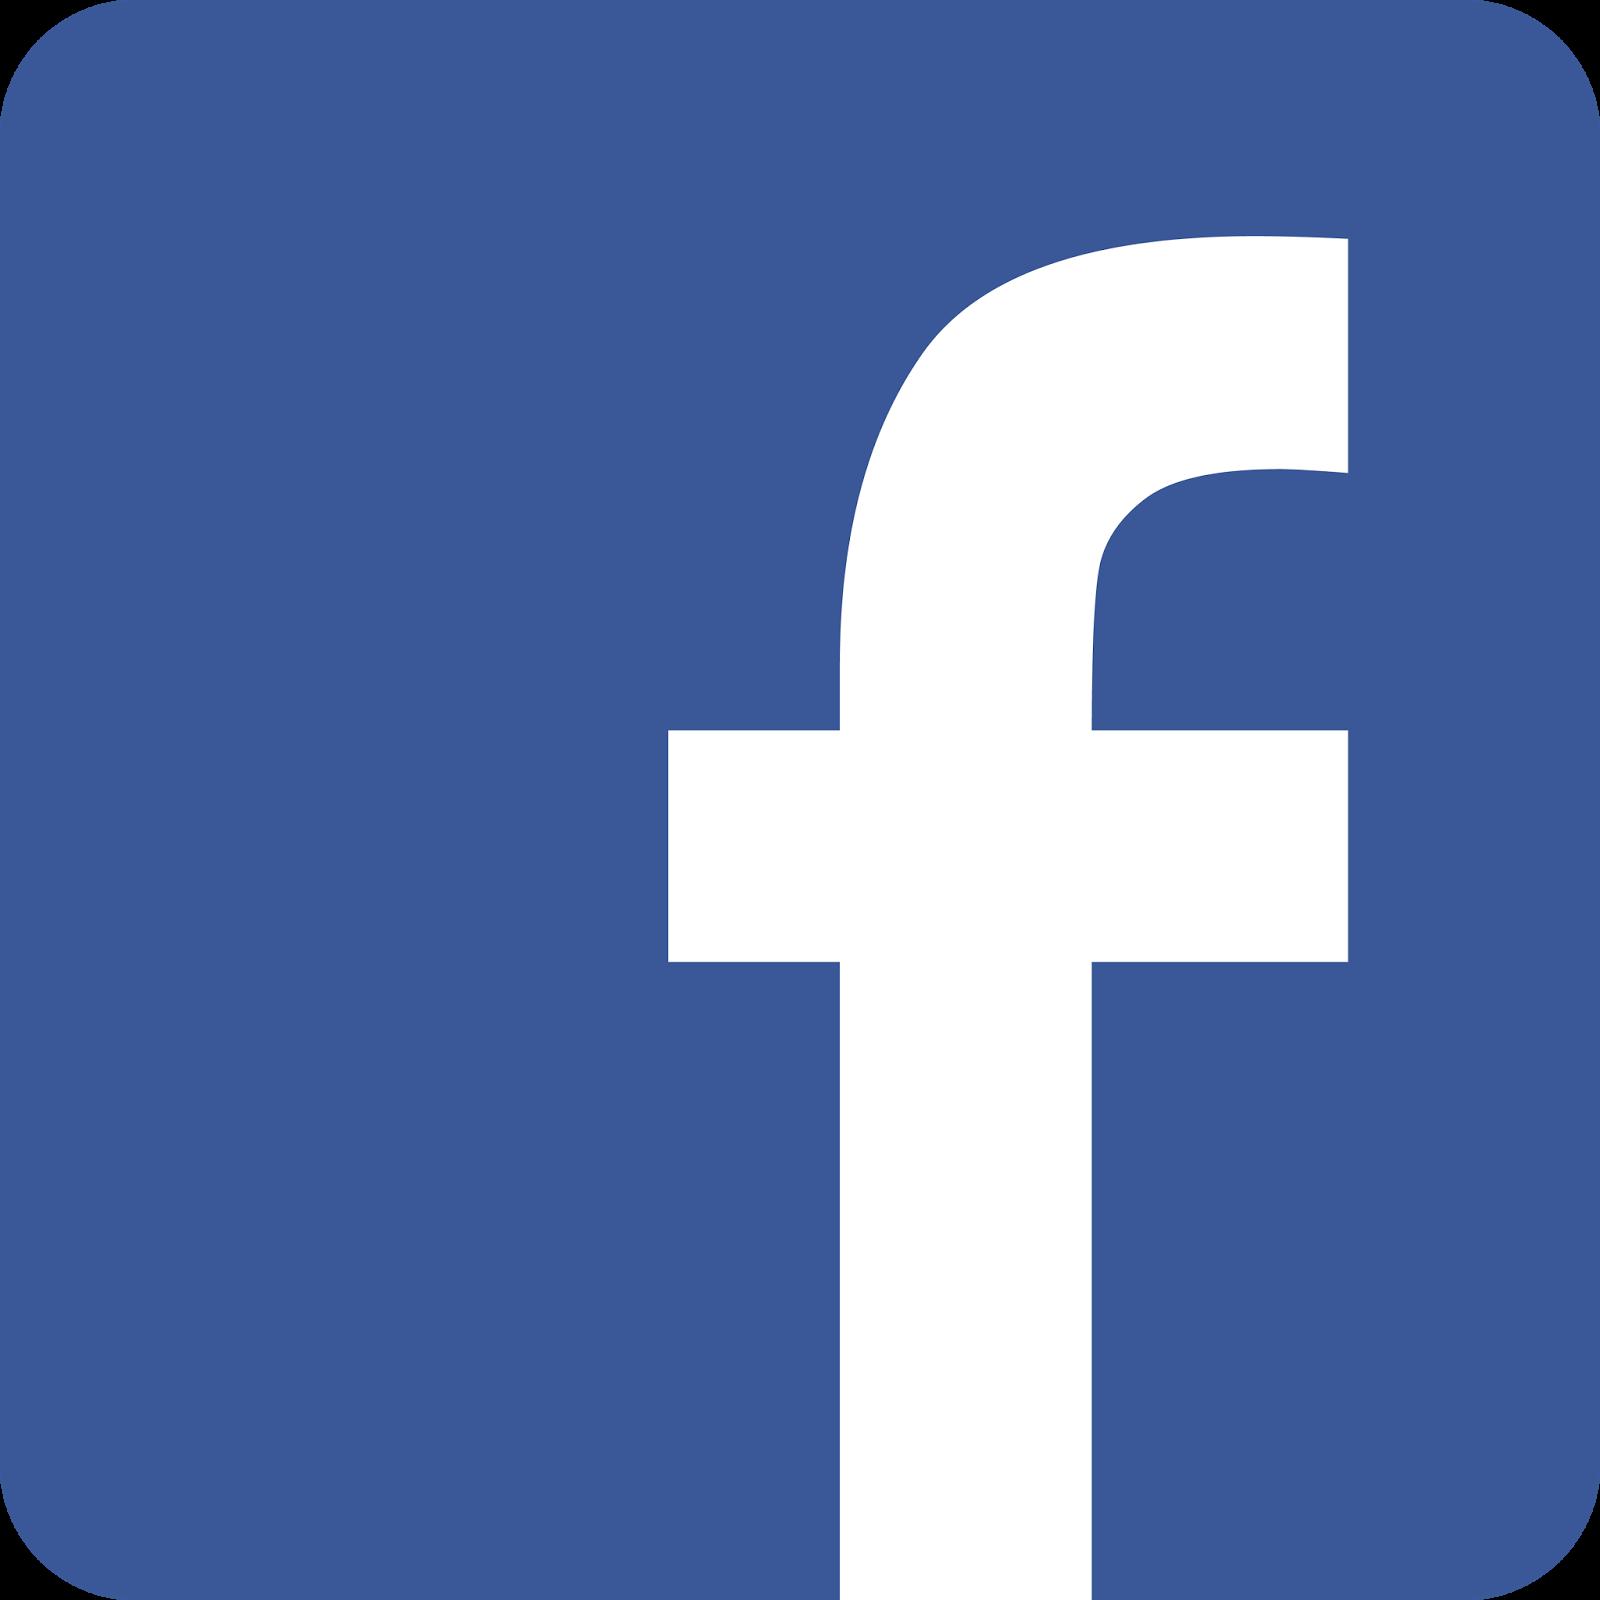 facebook-transparent-logo-png-0 • vermas-gmbh.de